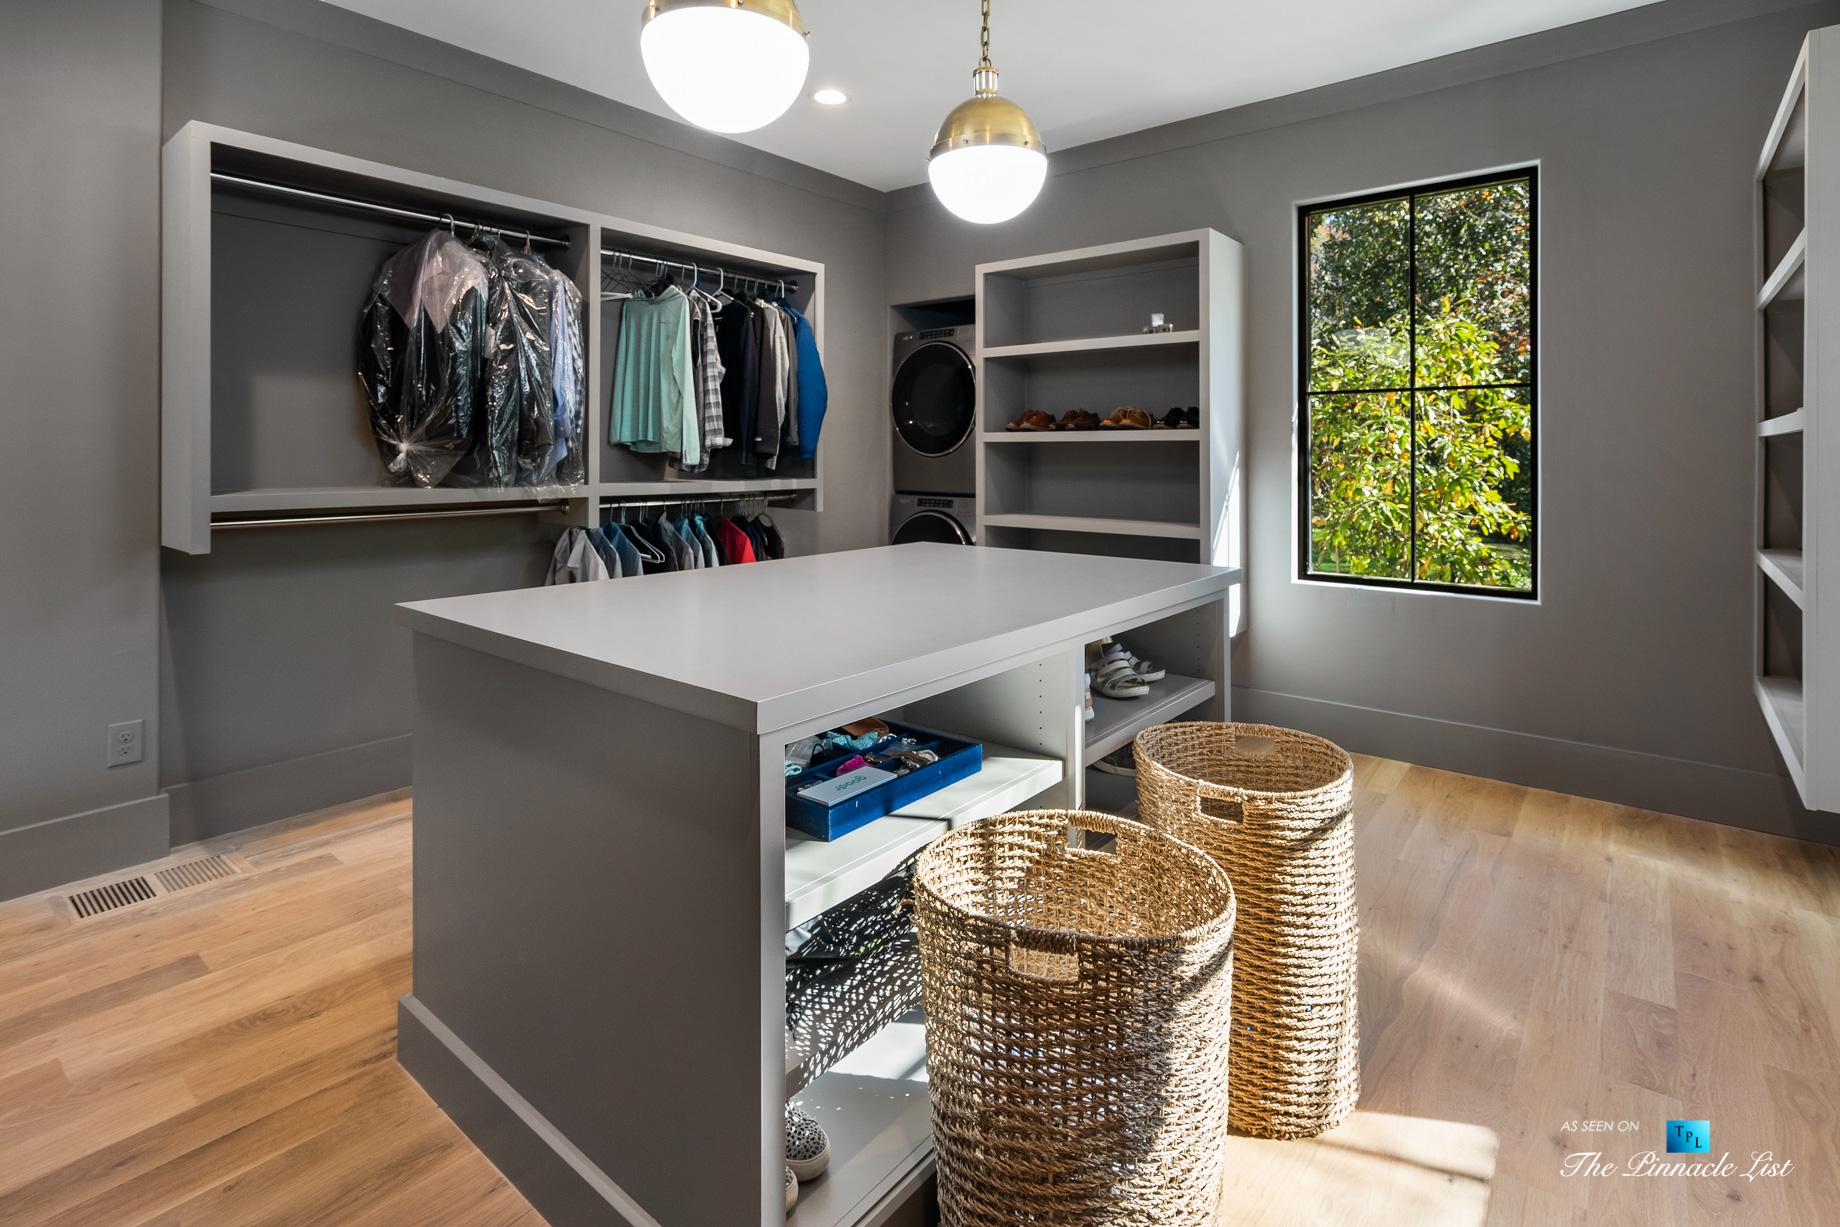 447 Valley Rd NW, Atlanta, GA, USA - Master Bedroom Walk In Closet Room - Luxury Real Estate - Tuxedo Park Home